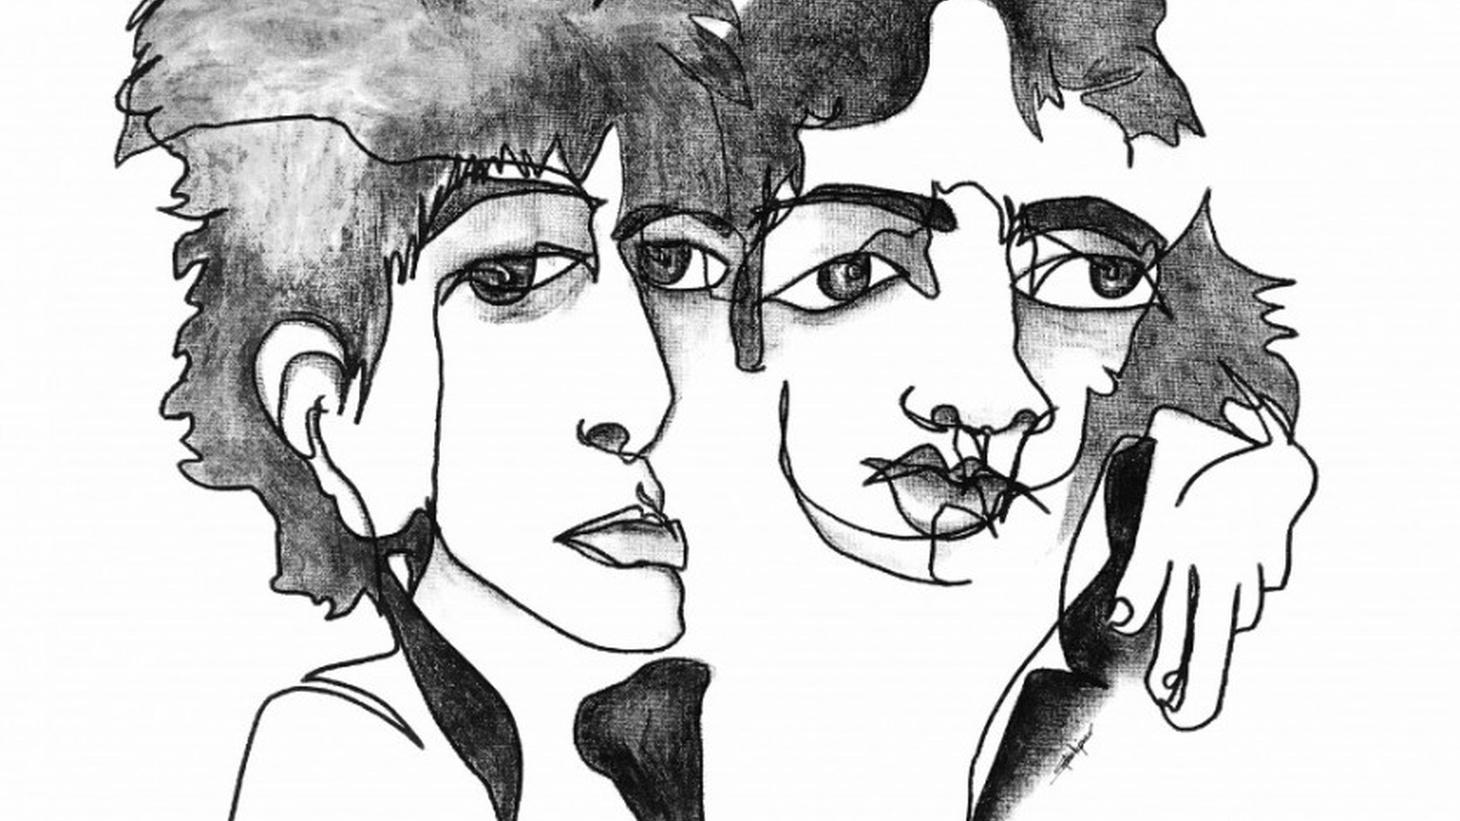 Sophie Kipner: Mick Jagger and Keith Richards